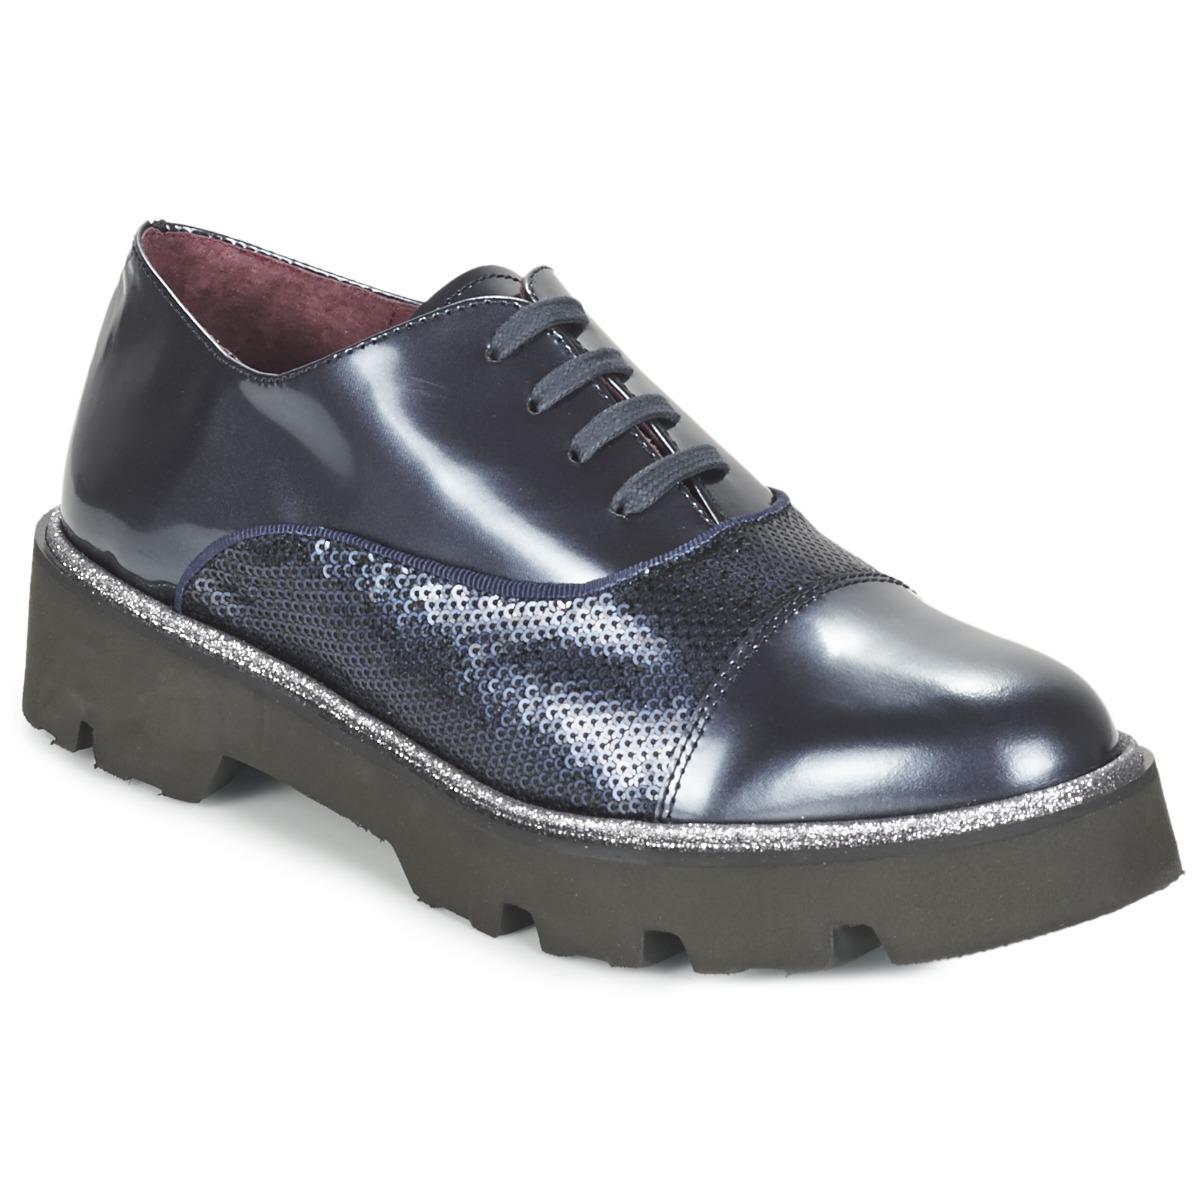 Fericelli FANCHON Marine - Kostenloser Versand bei Spartoode ! - Schuhe Richelieu Damen 101,50 €